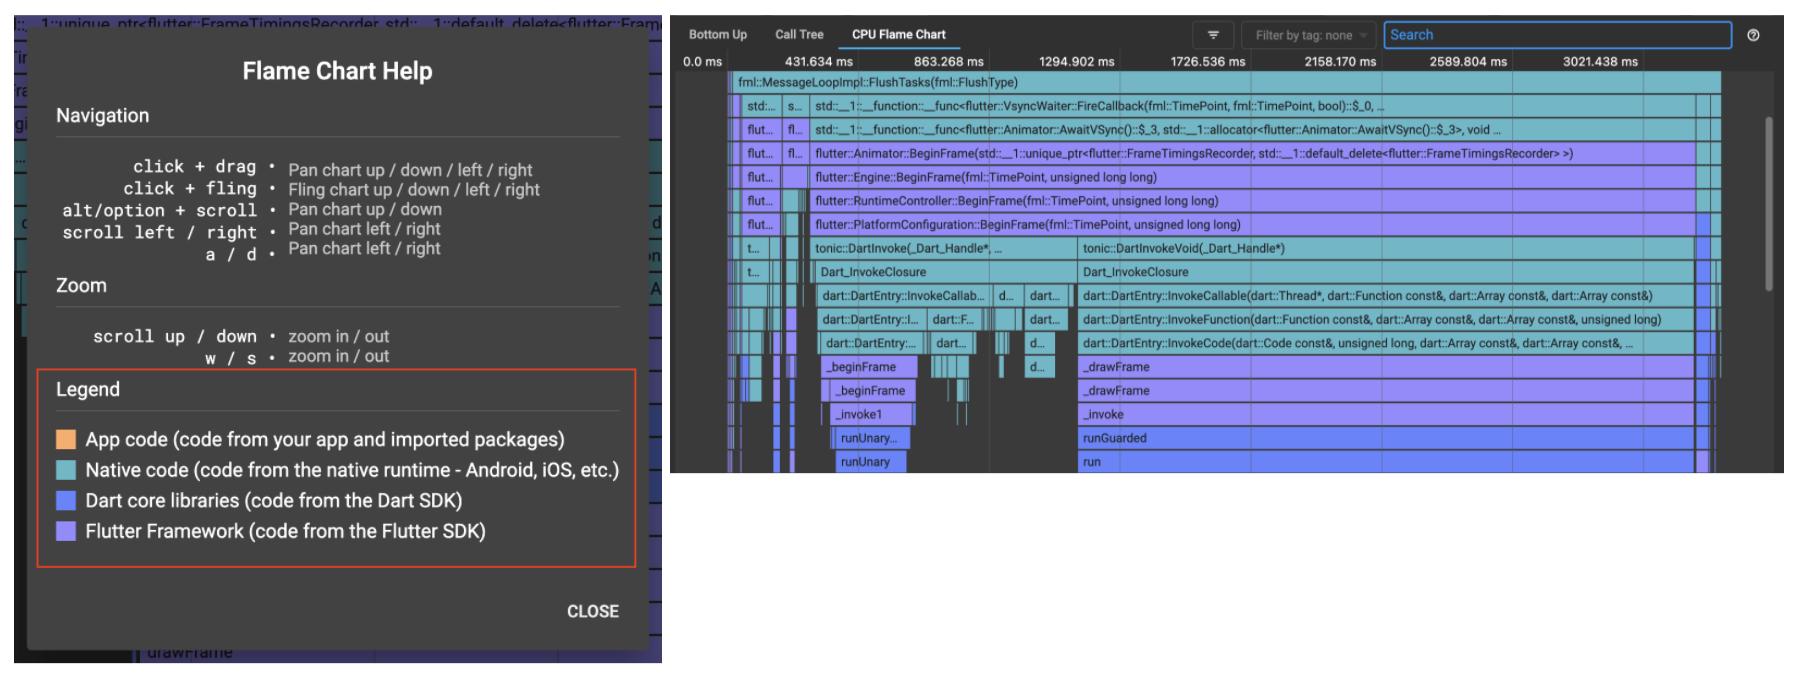 Colored frame chart to identify app vs. native vs. Dart vs. Flutter code activities in your app